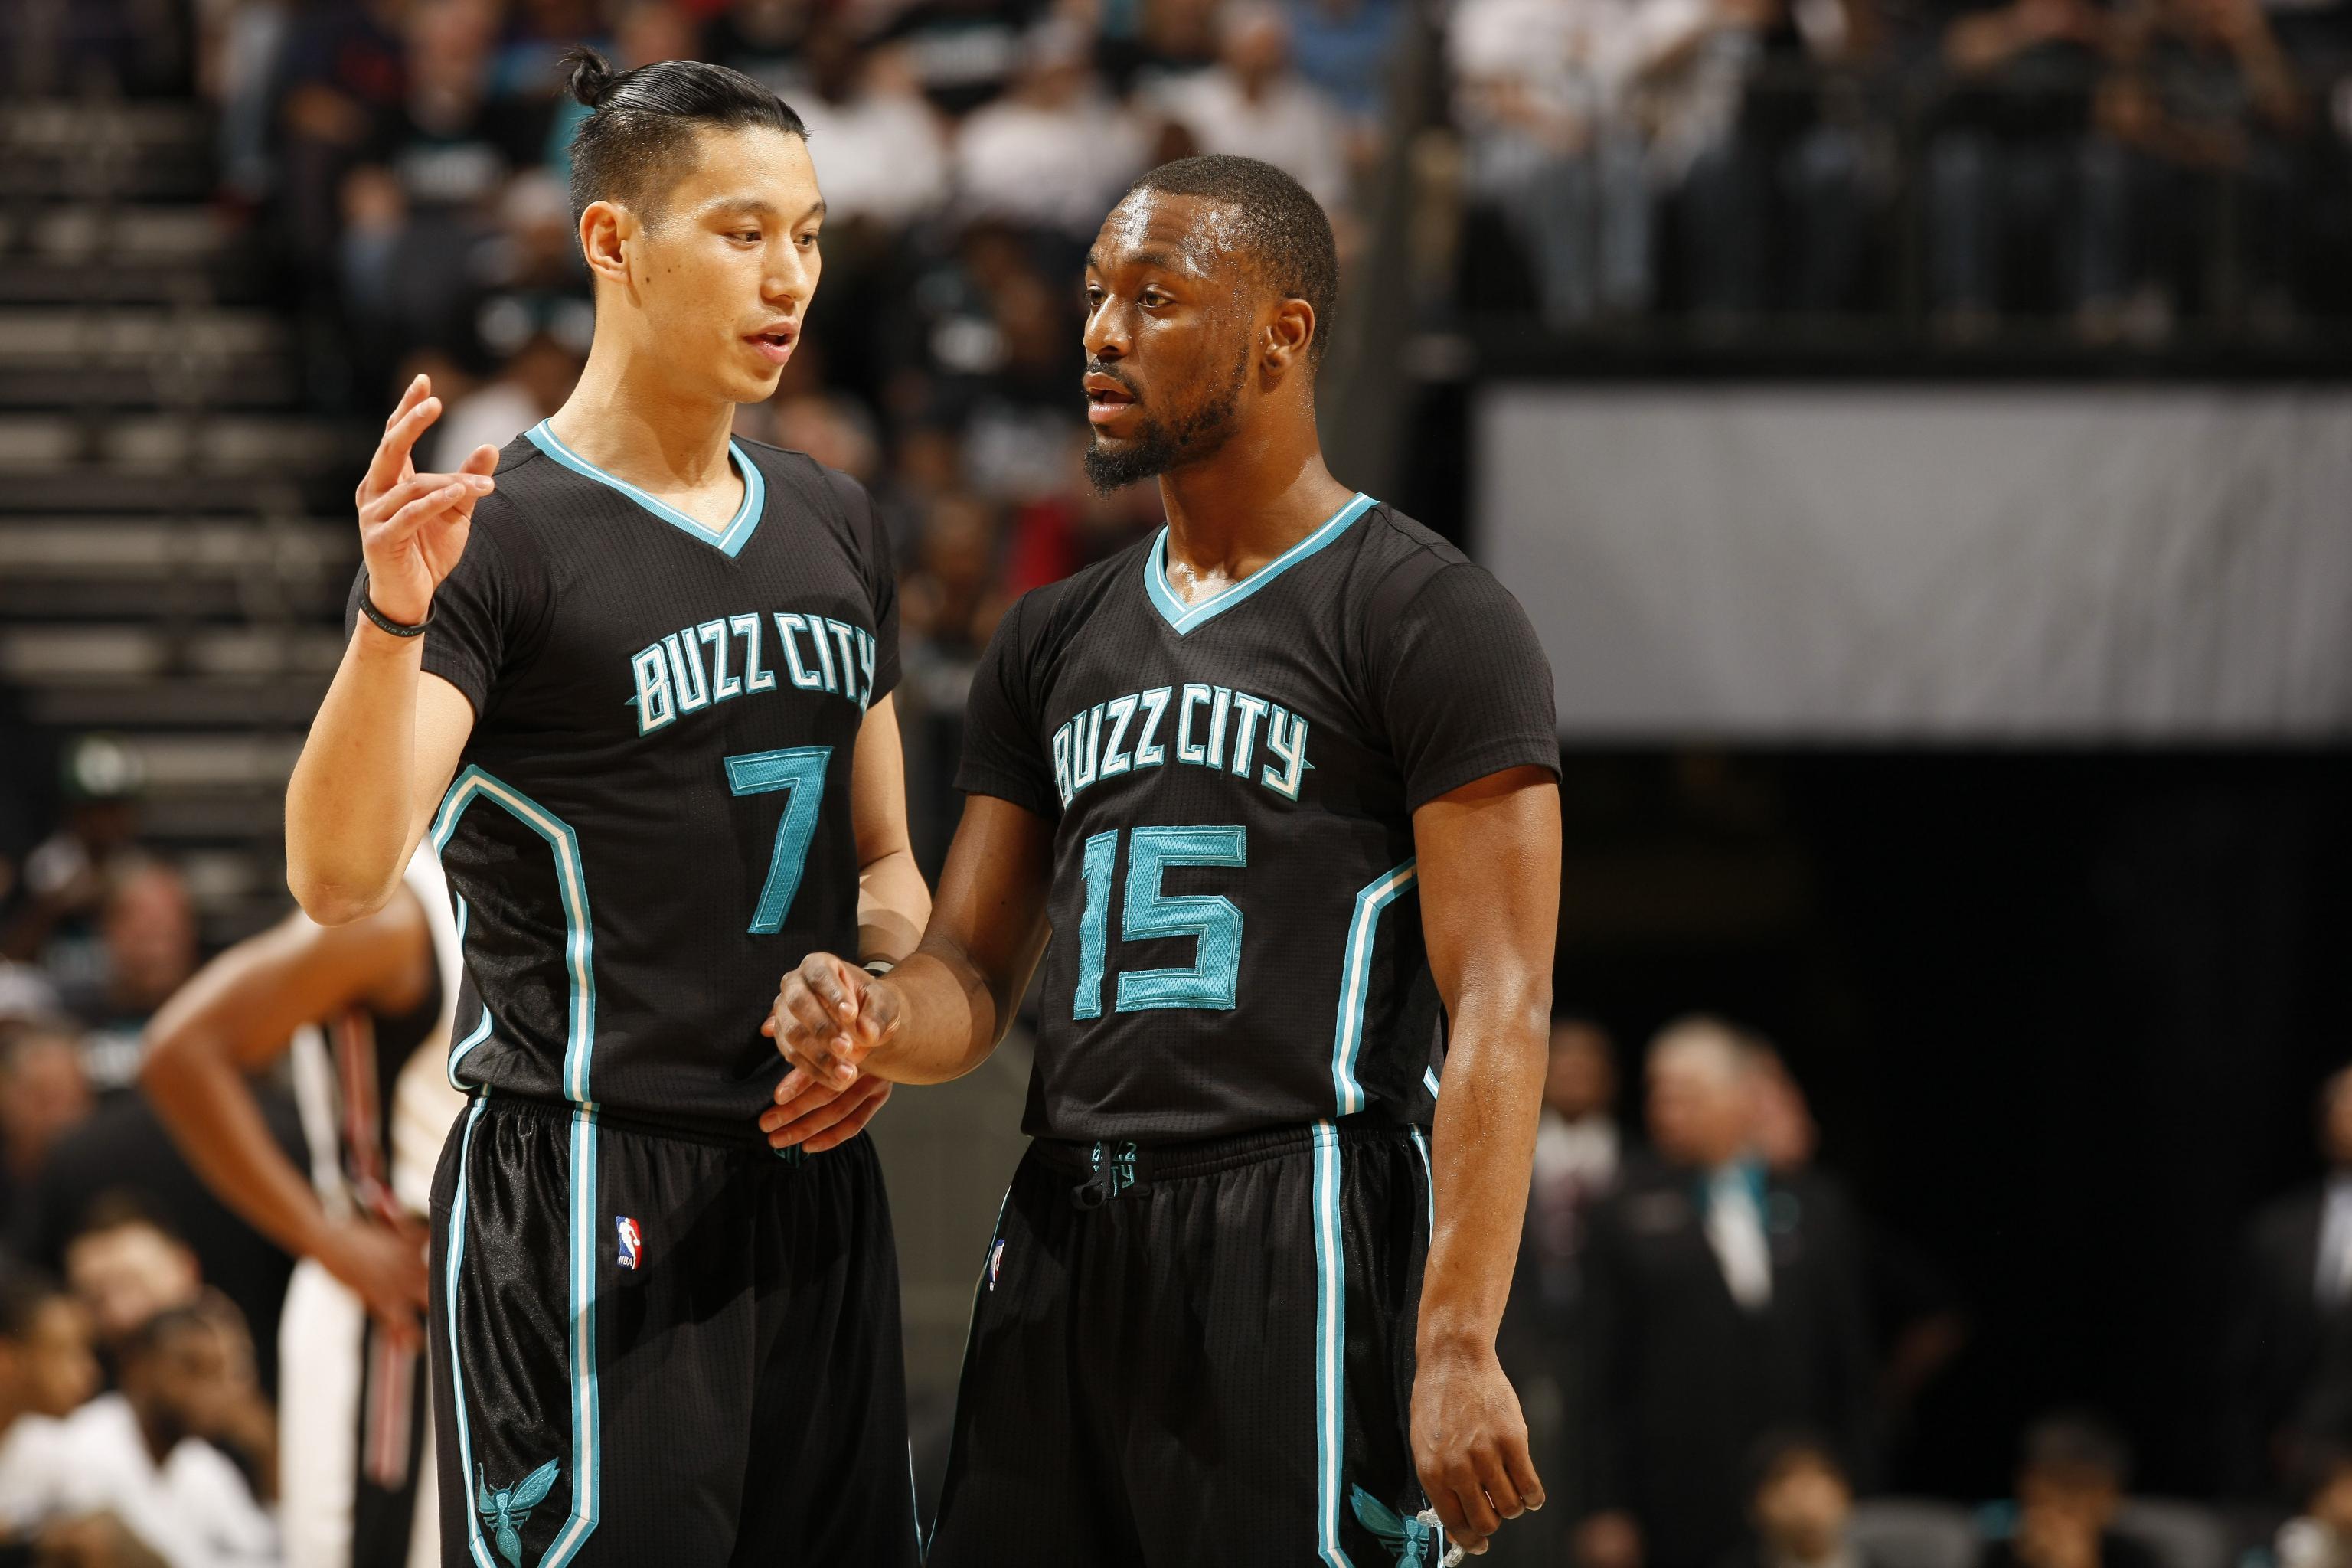 meet 59ab5 b576a Kemba Walker, Charlotte Hornets Getting Help from Jeremy Lin ...